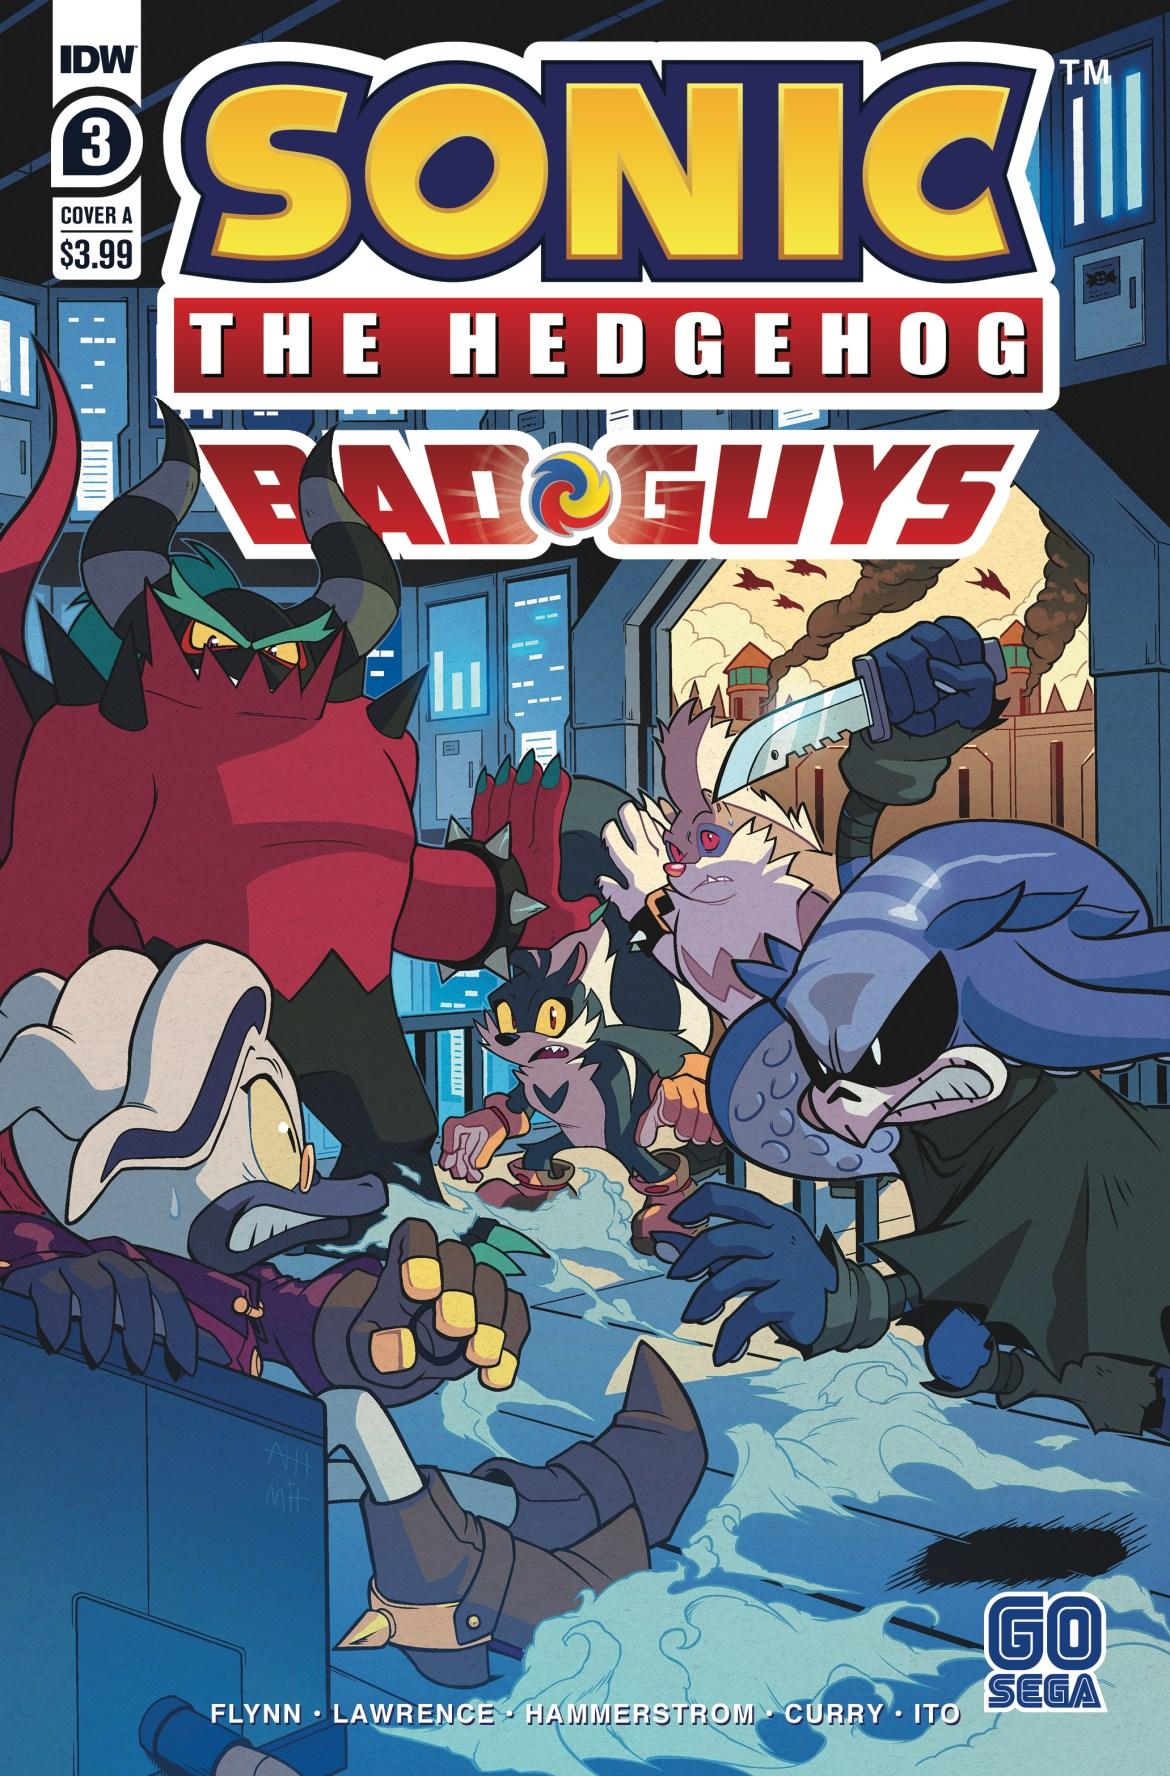 STH-BG03_cvrA ComicList Previews: SONIC THE HEDGEHOG BAD GUYS #3 (OF 4)